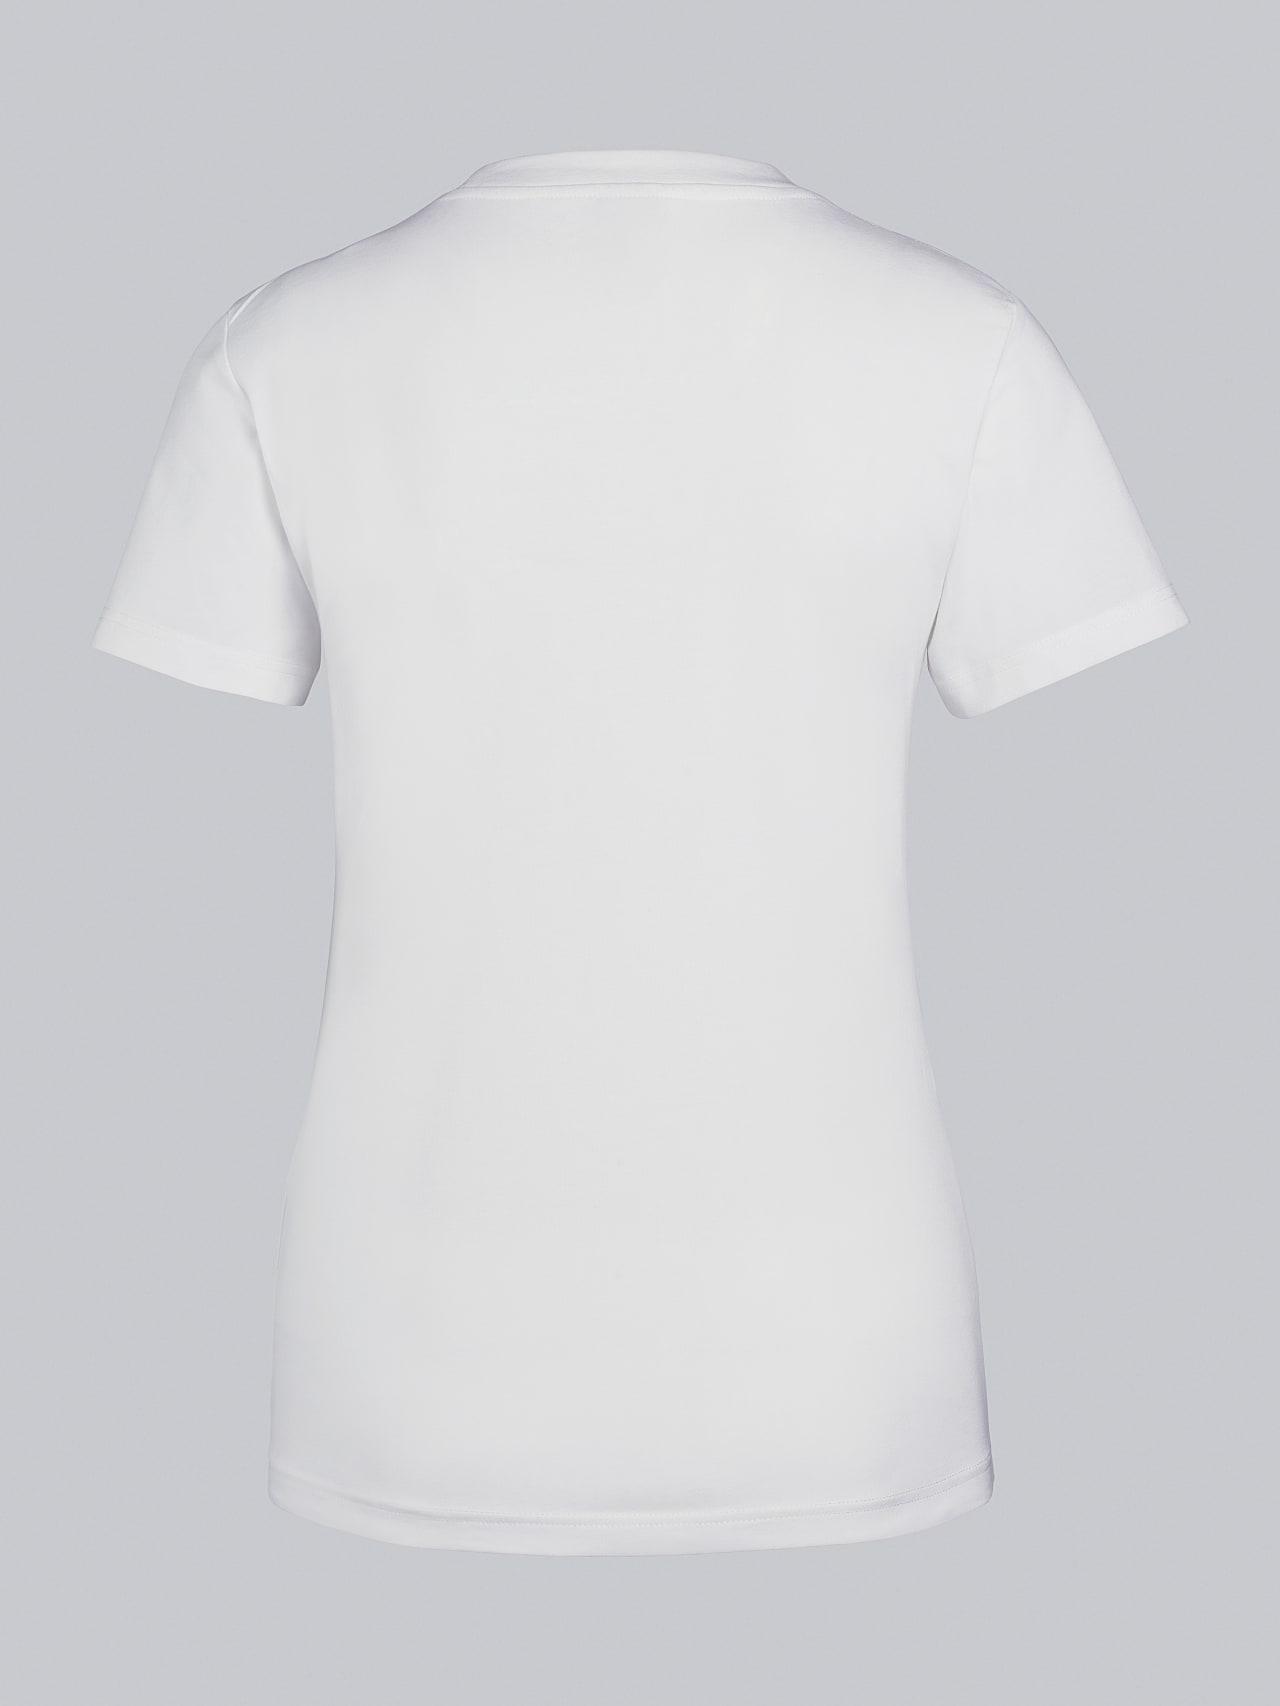 JOCTI V3.Y5.02 Logo T-Shirt offwhite Left Alpha Tauri